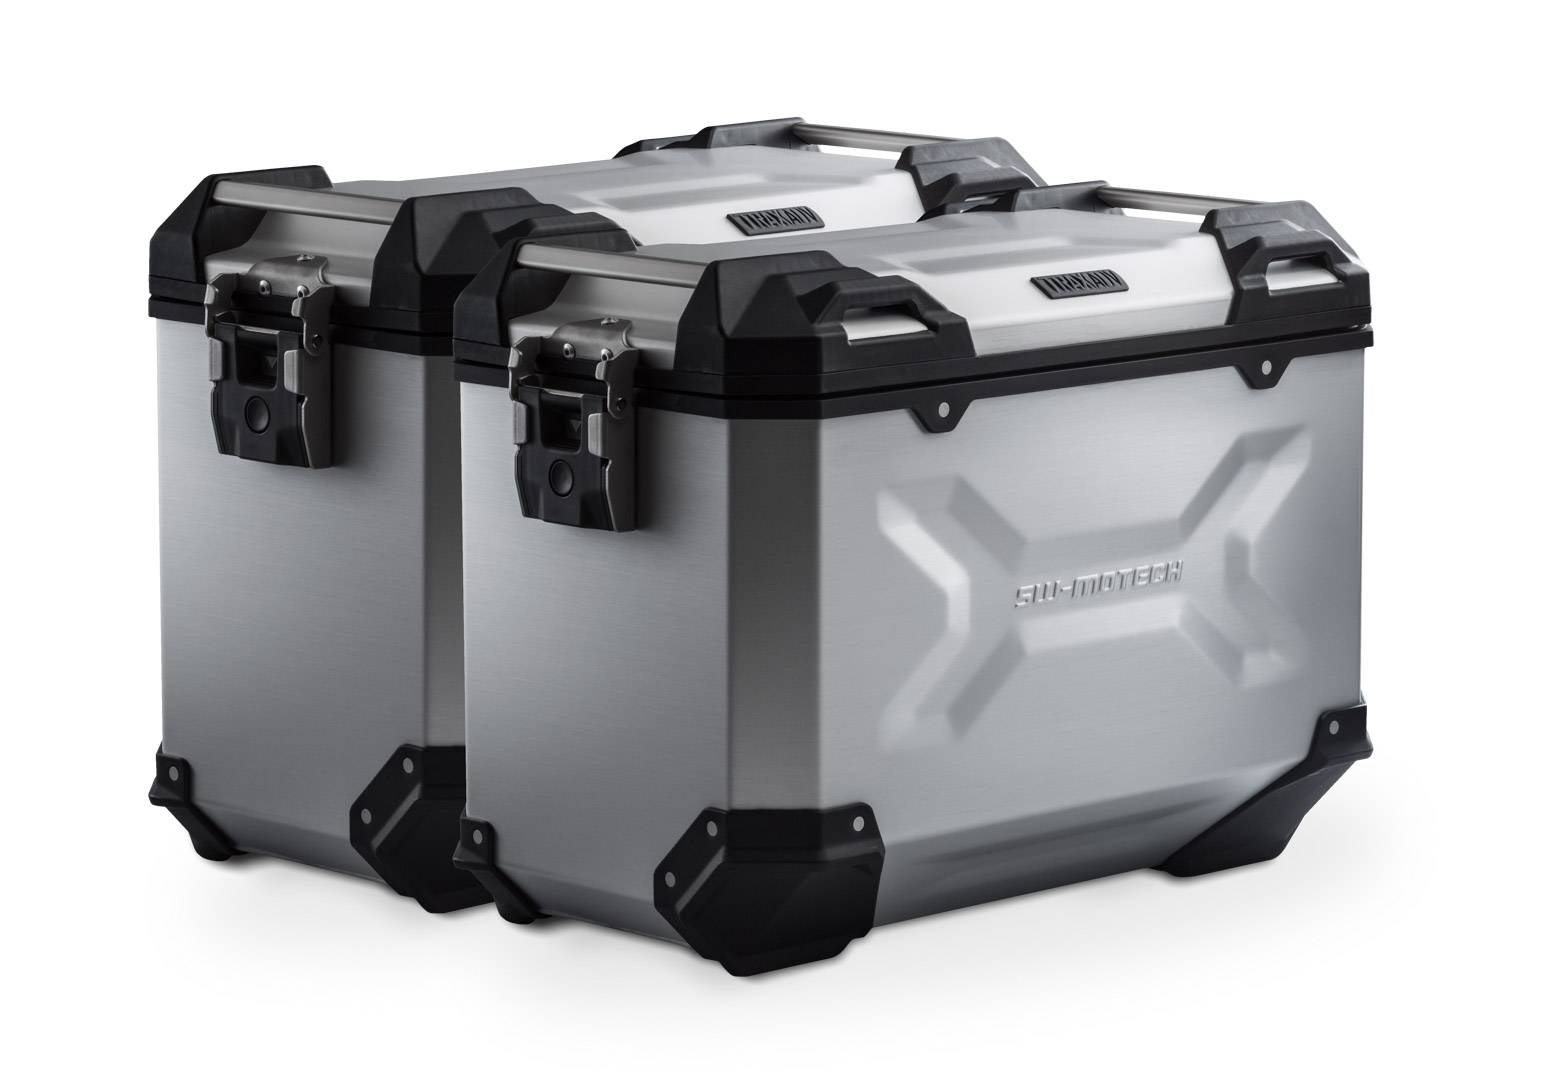 SW-Motech Sistema de maletas TRAX ADV - Plateado. 45/45 l. MT-09Tracer/Tracer 900GT (17-).